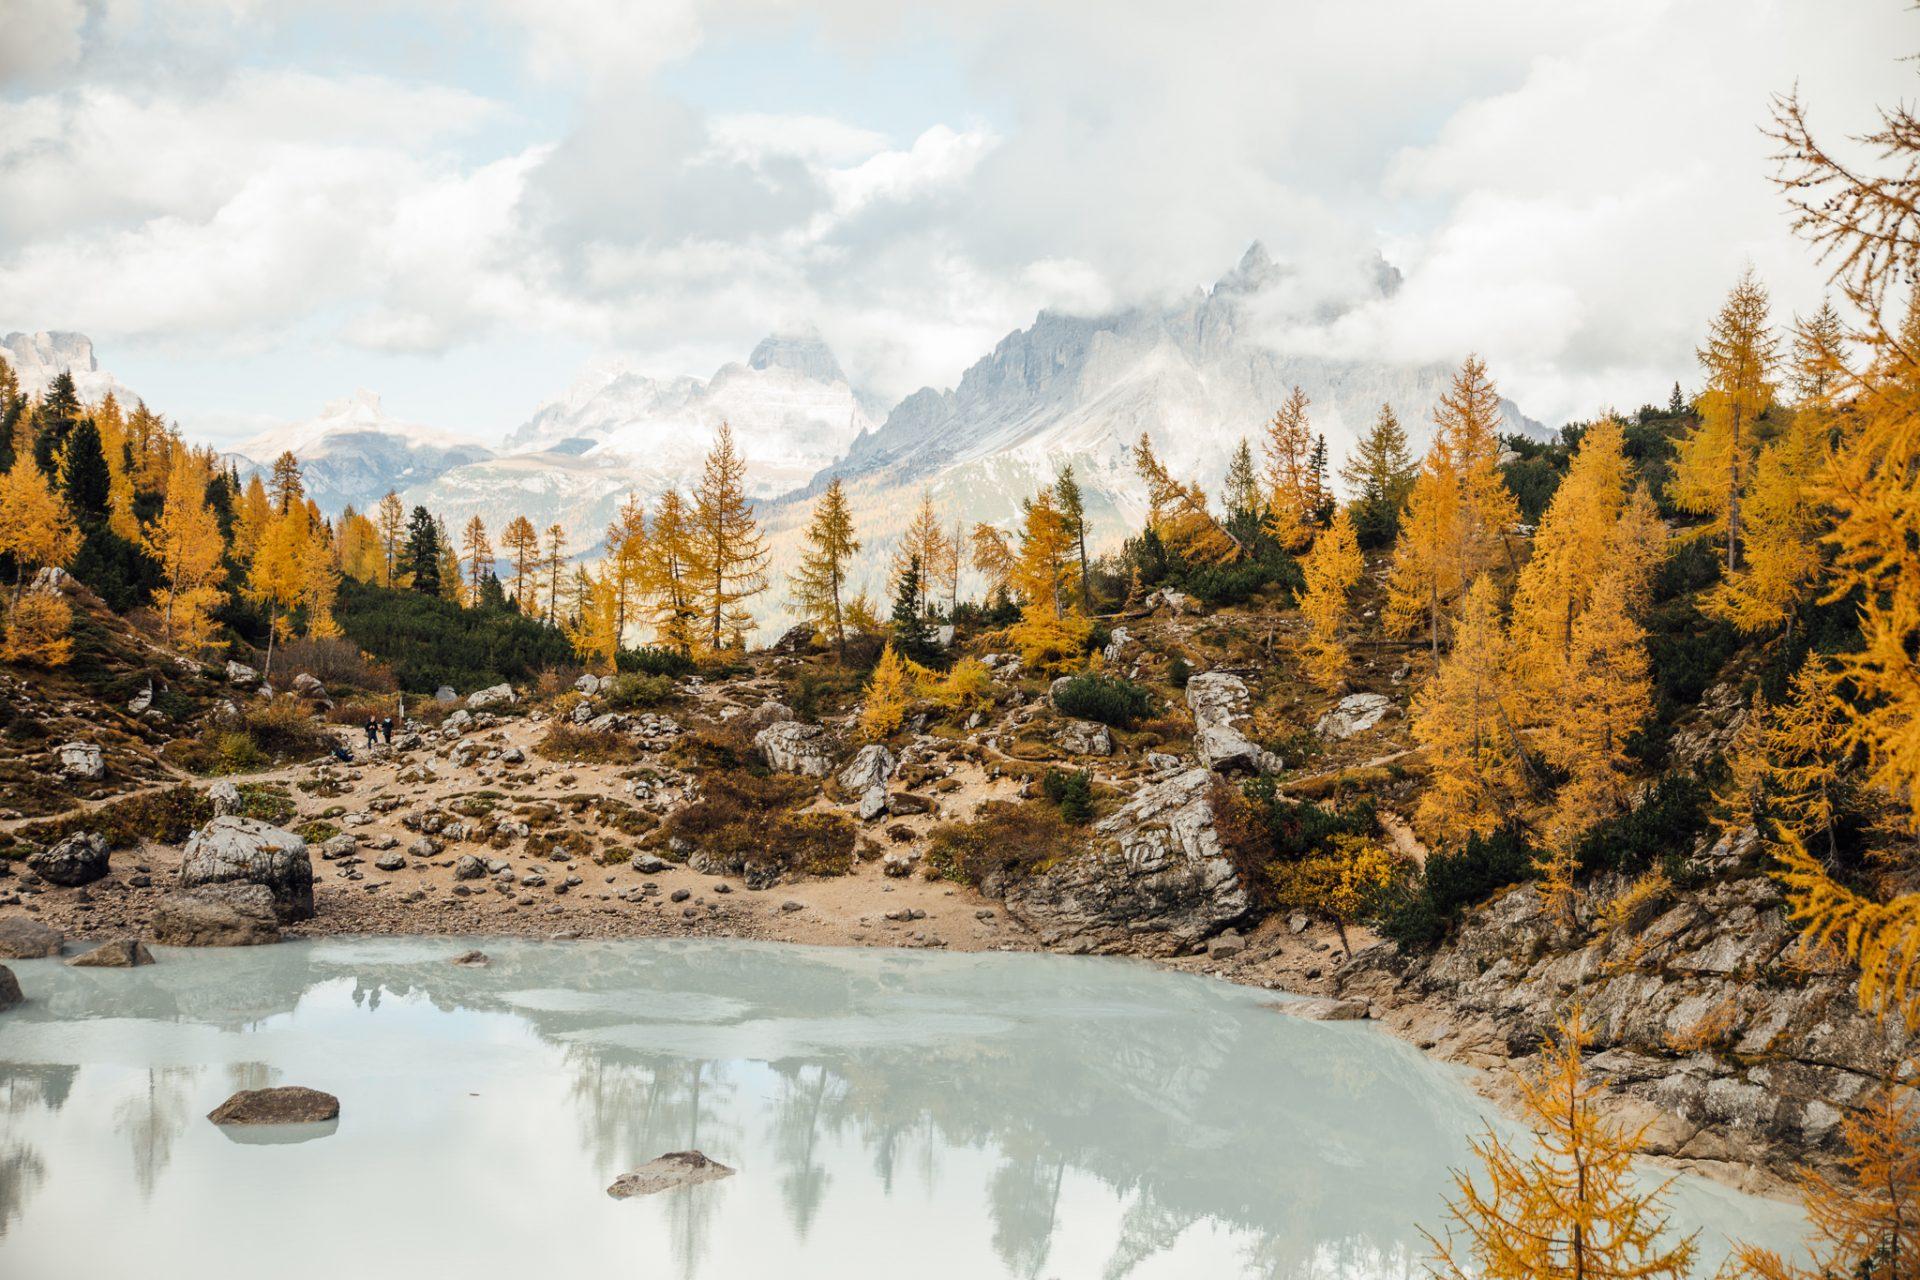 turkusowe-jeziorko-dolomity-lago-di-sorapis